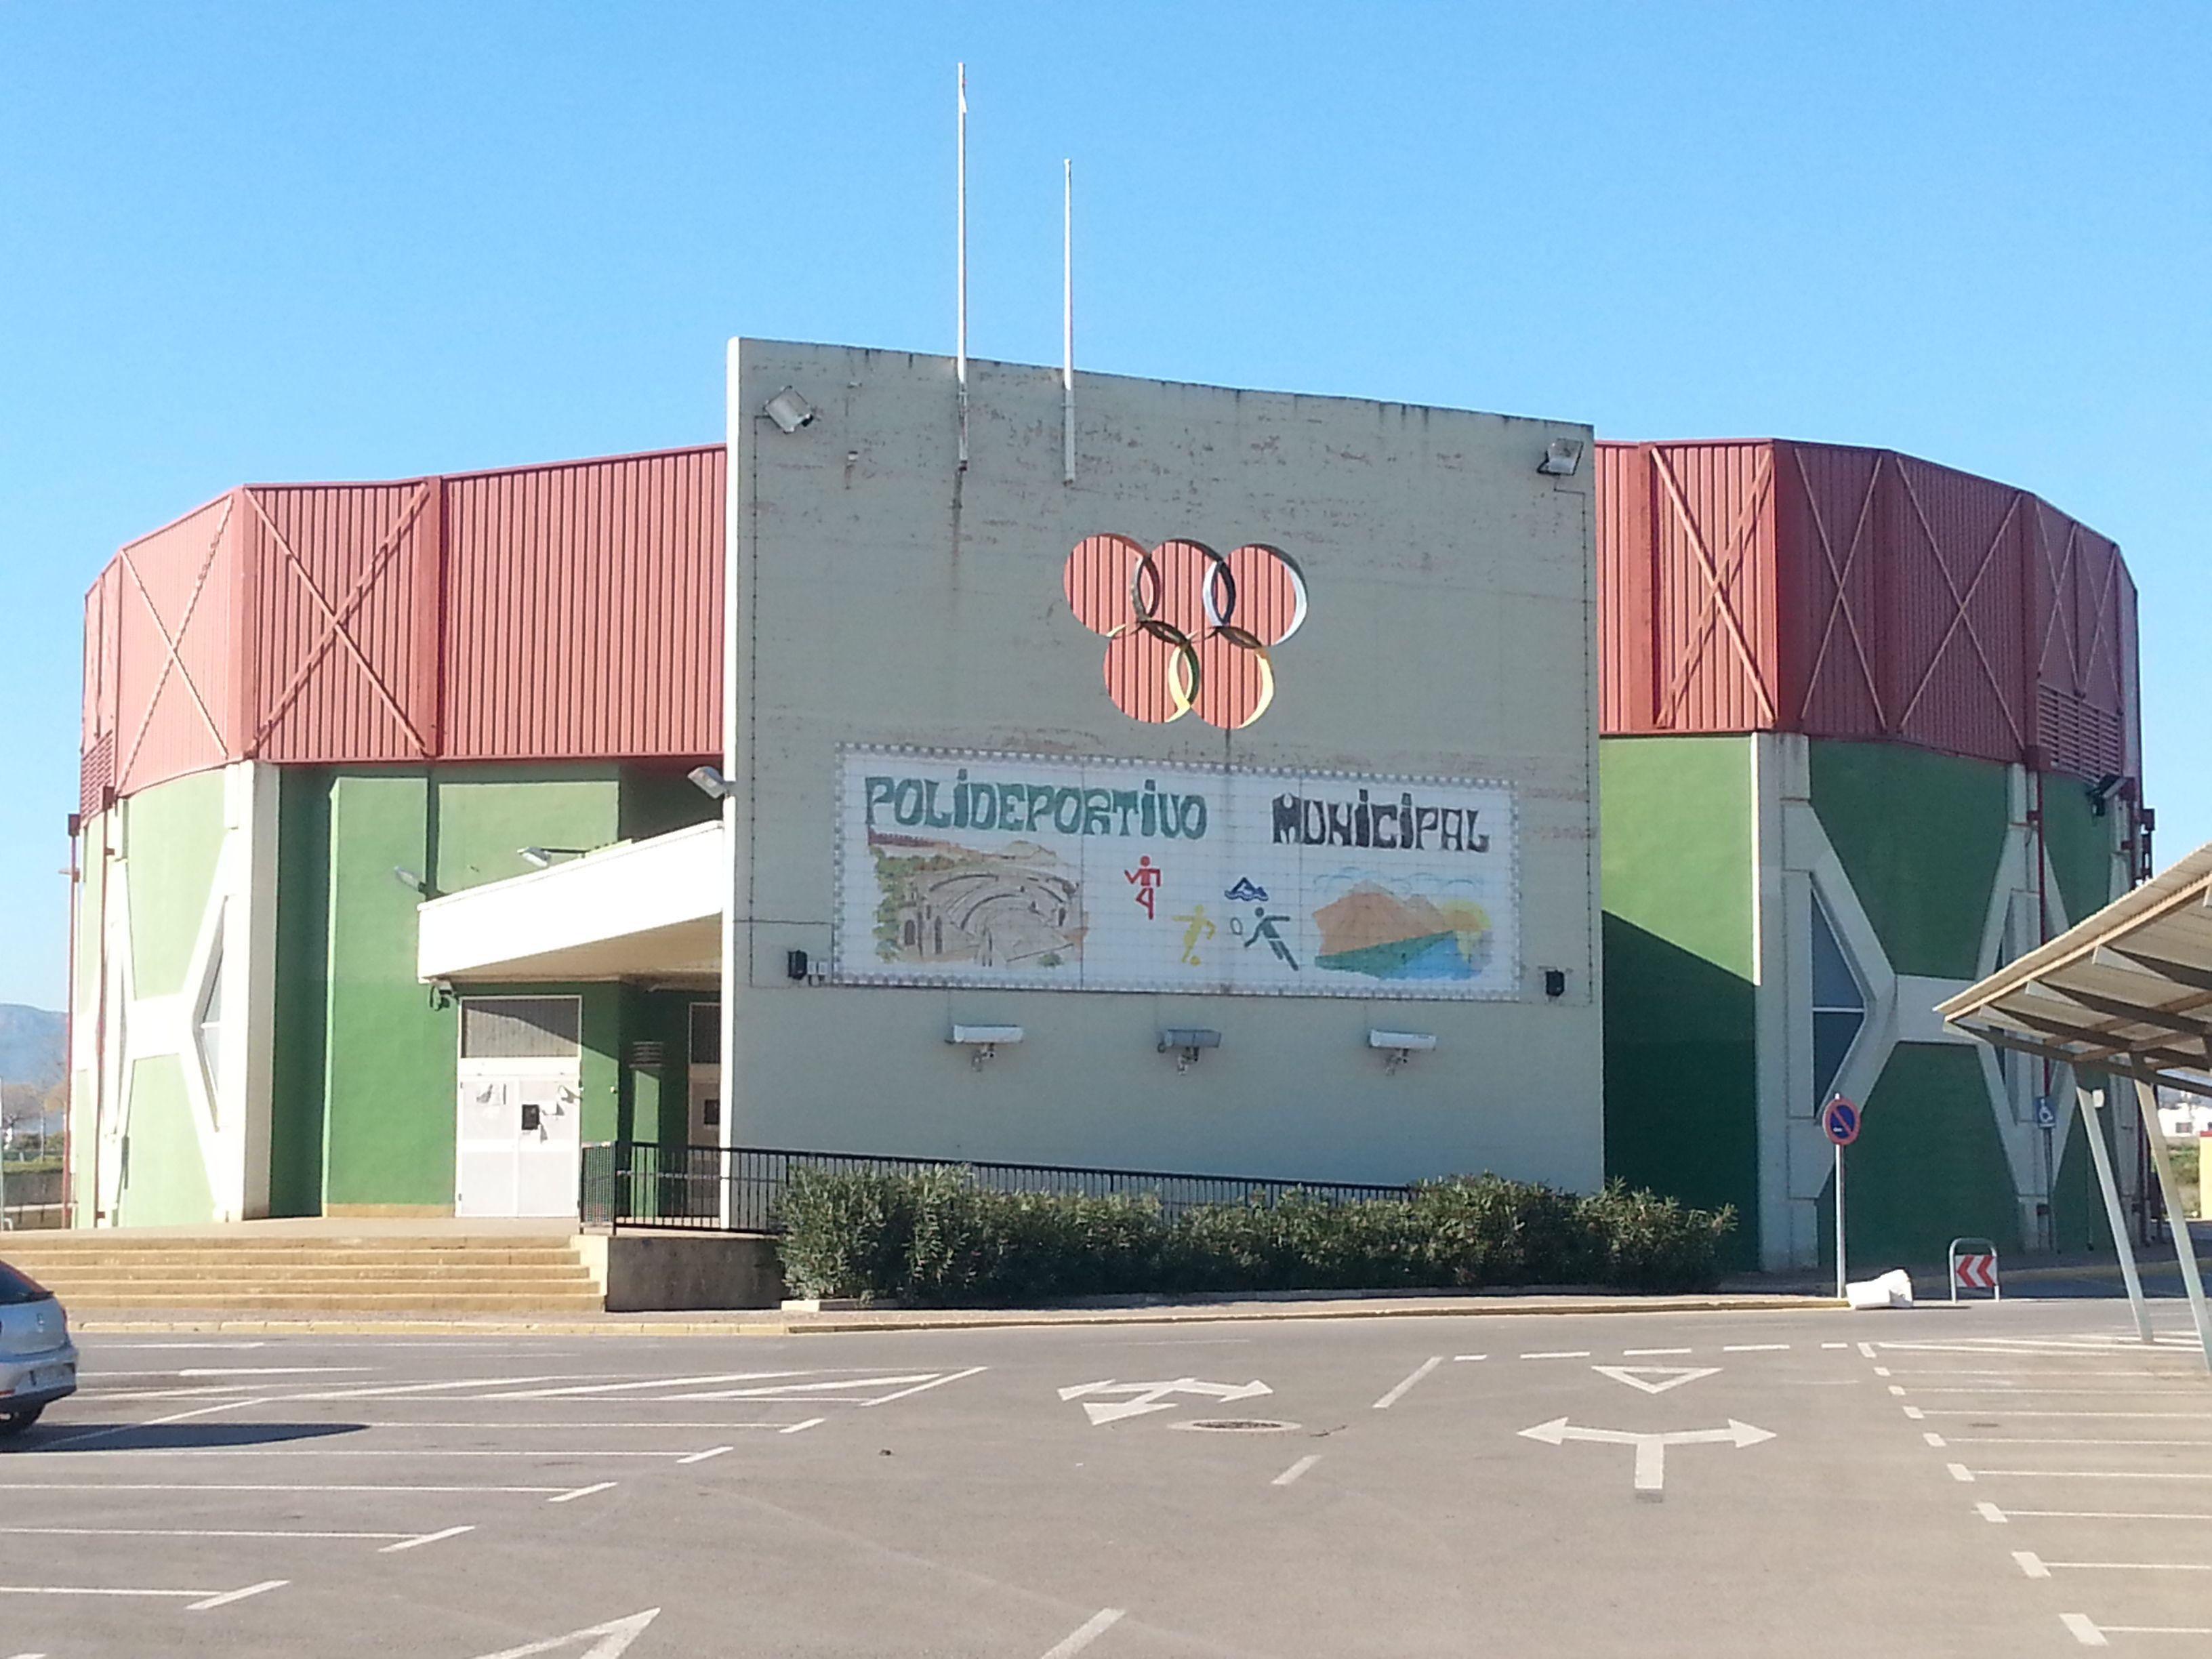 Polideportivo municipal internucleos ovni pabell n del b for Polideportivo ciudad jardin